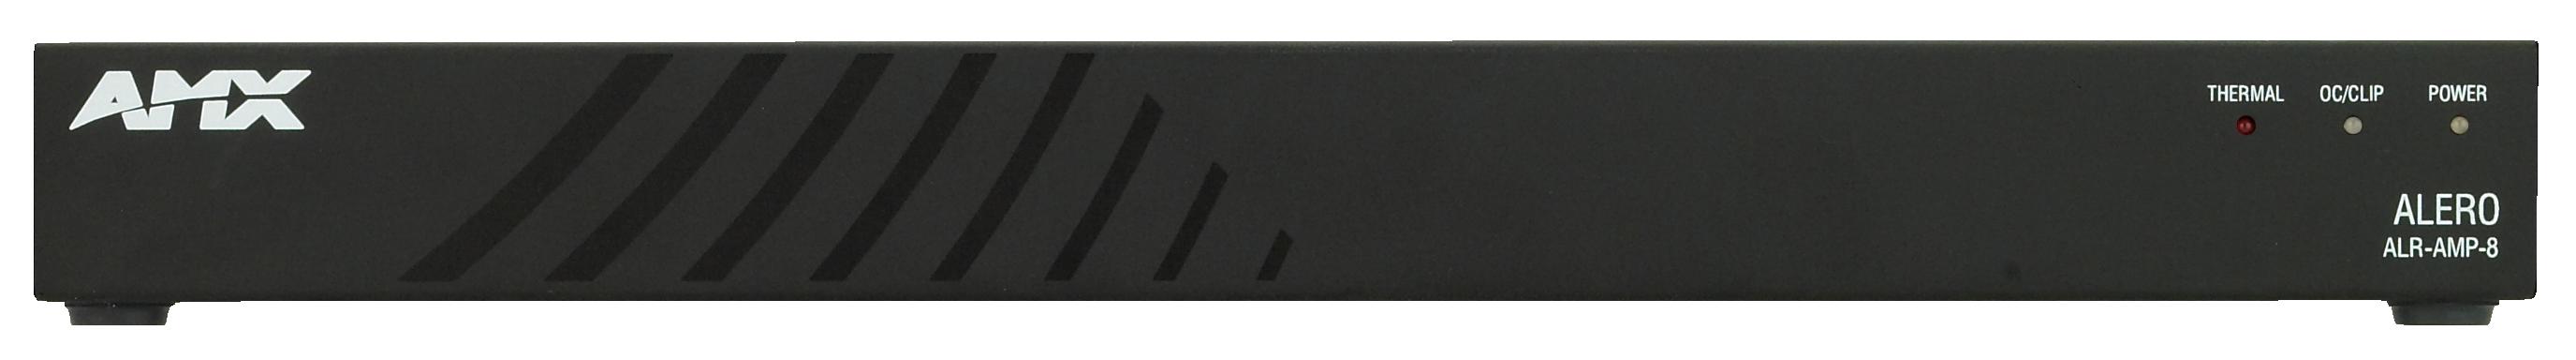 ALR-AMP-8 - Front